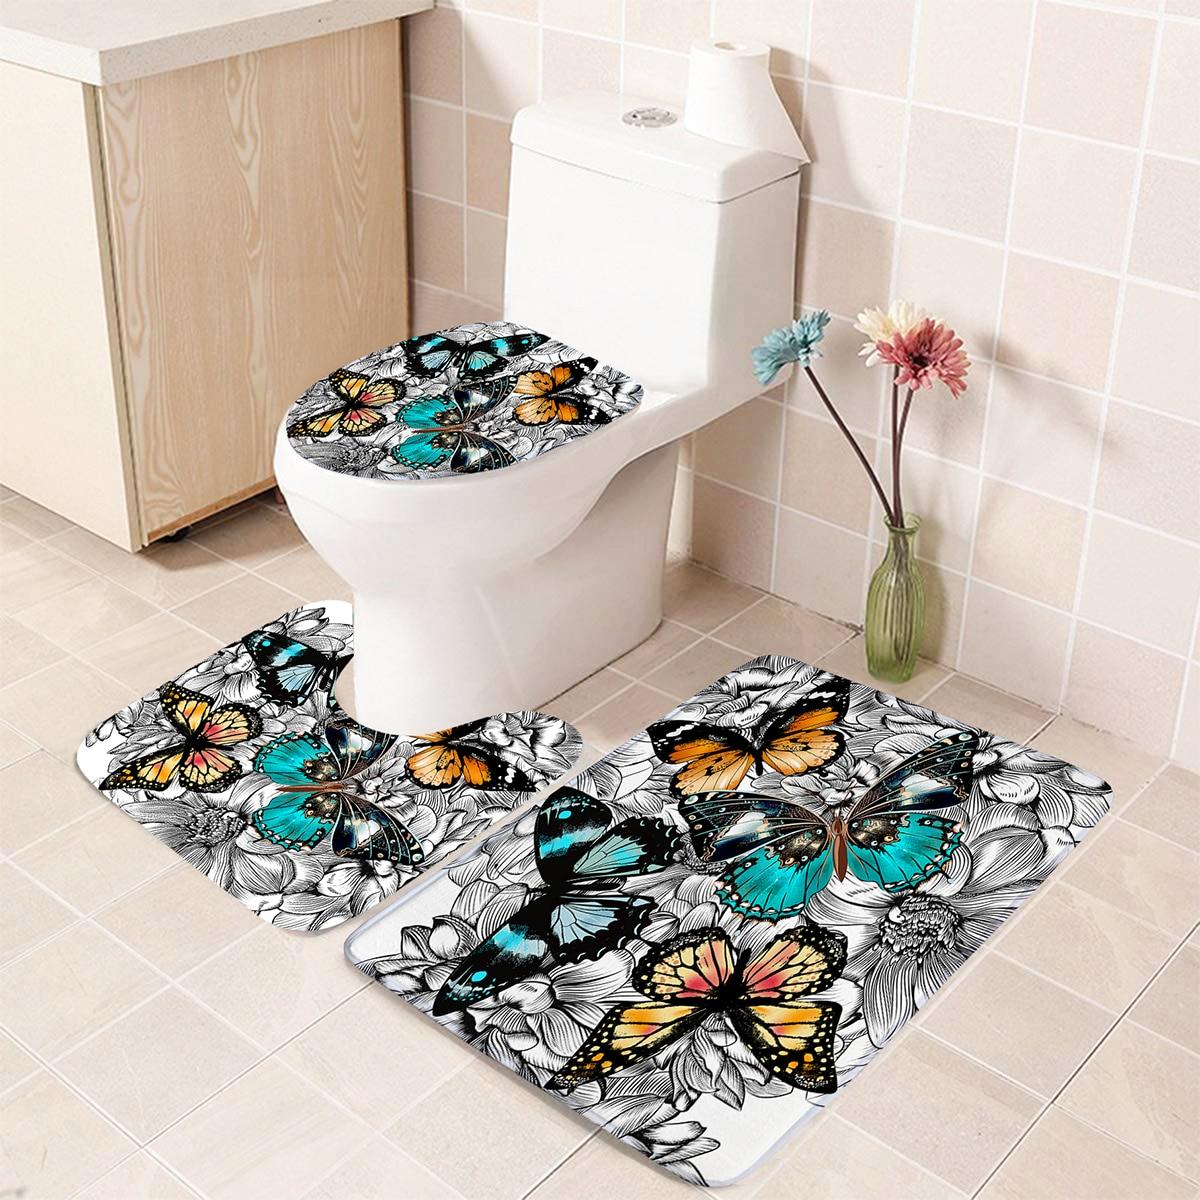 1 Stück Closestool Anti-Rutsch-Matte mit Schmetterling Muster